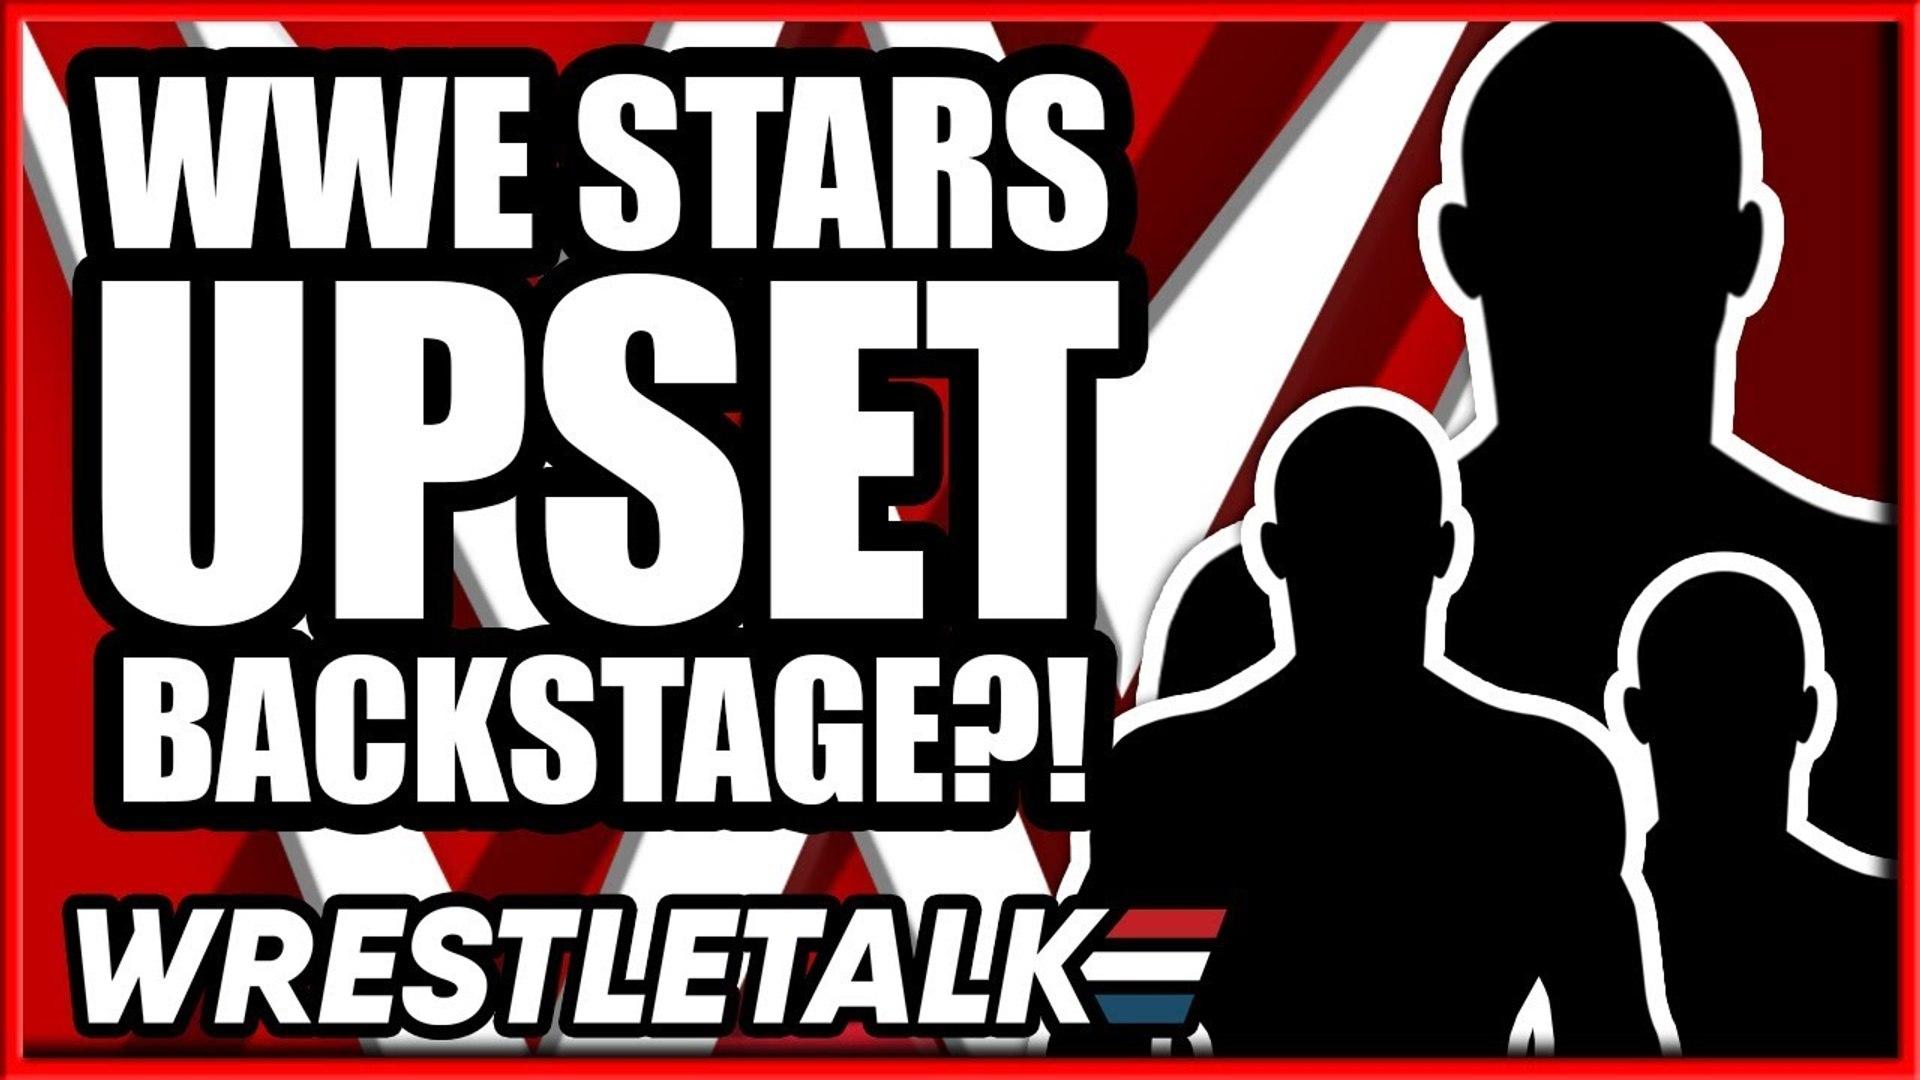 New WWE Champions! Sasha Banks Update! WWE Stars UPSET Backstage?!   WrestleTalk News June 2019